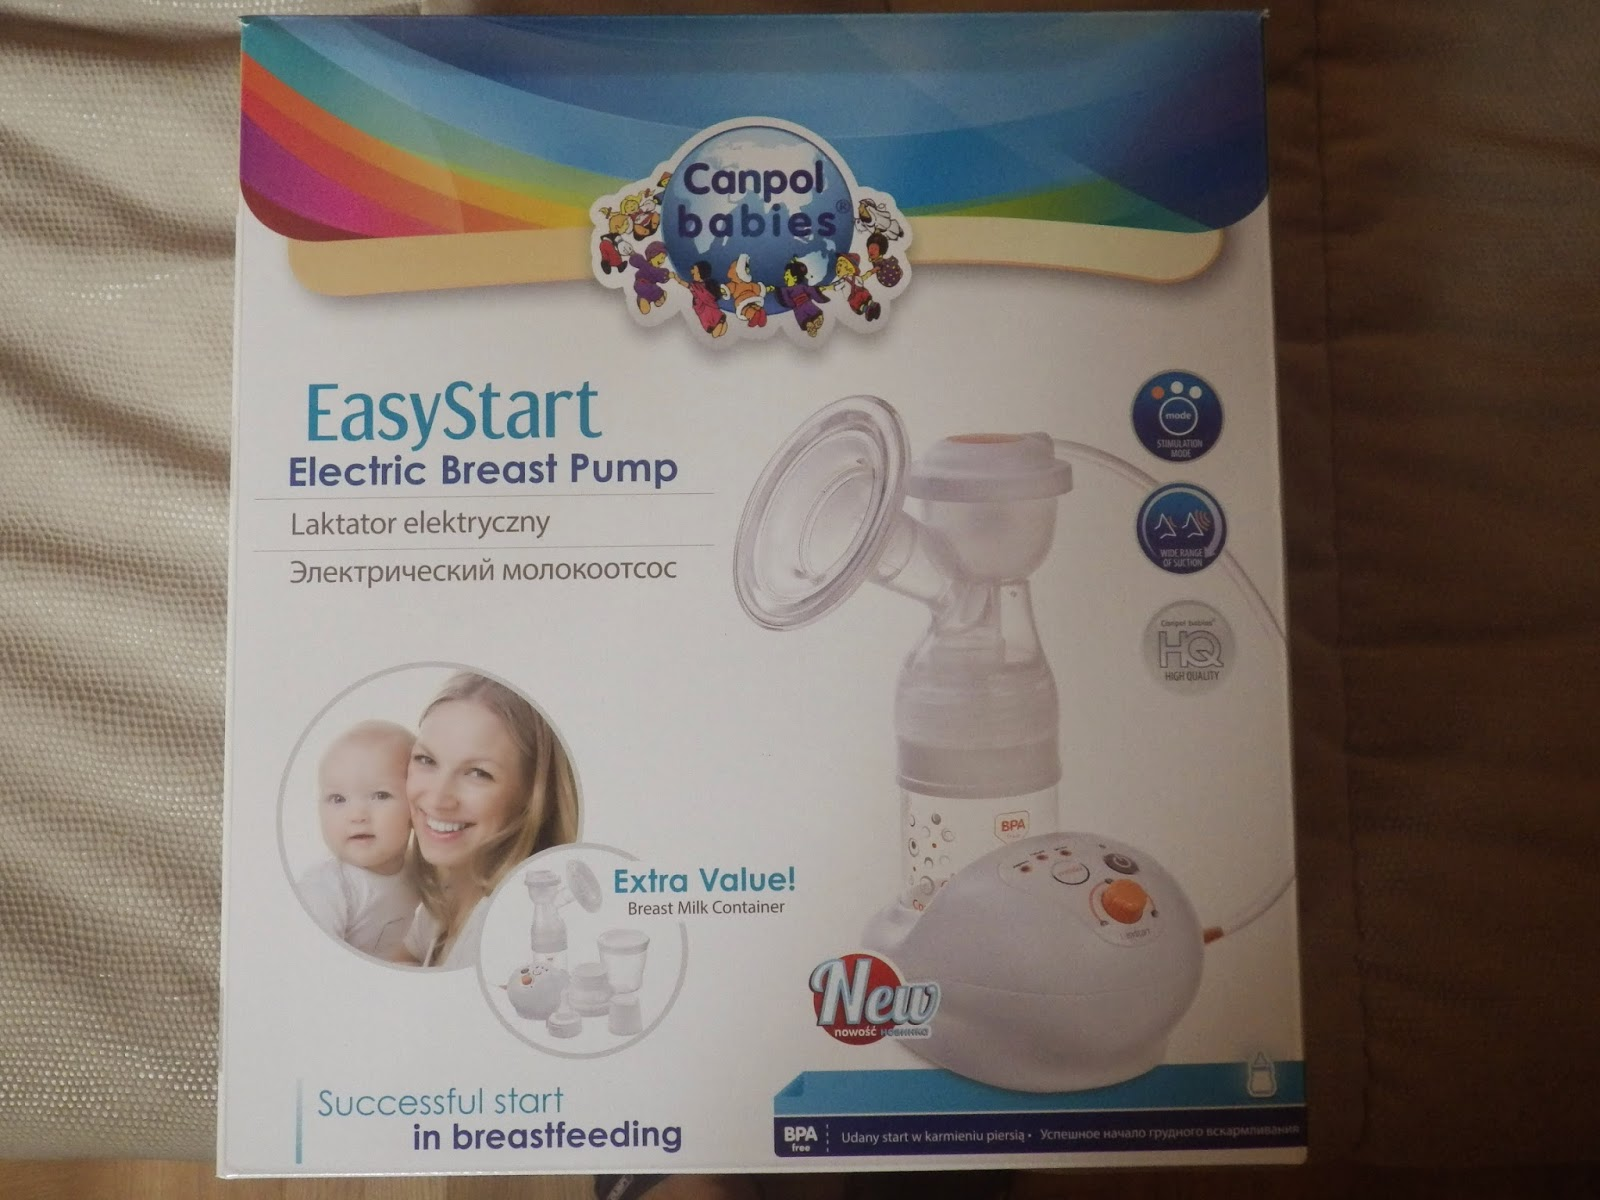 laktator elektryczny EasyStart 12/201 Canpol babies